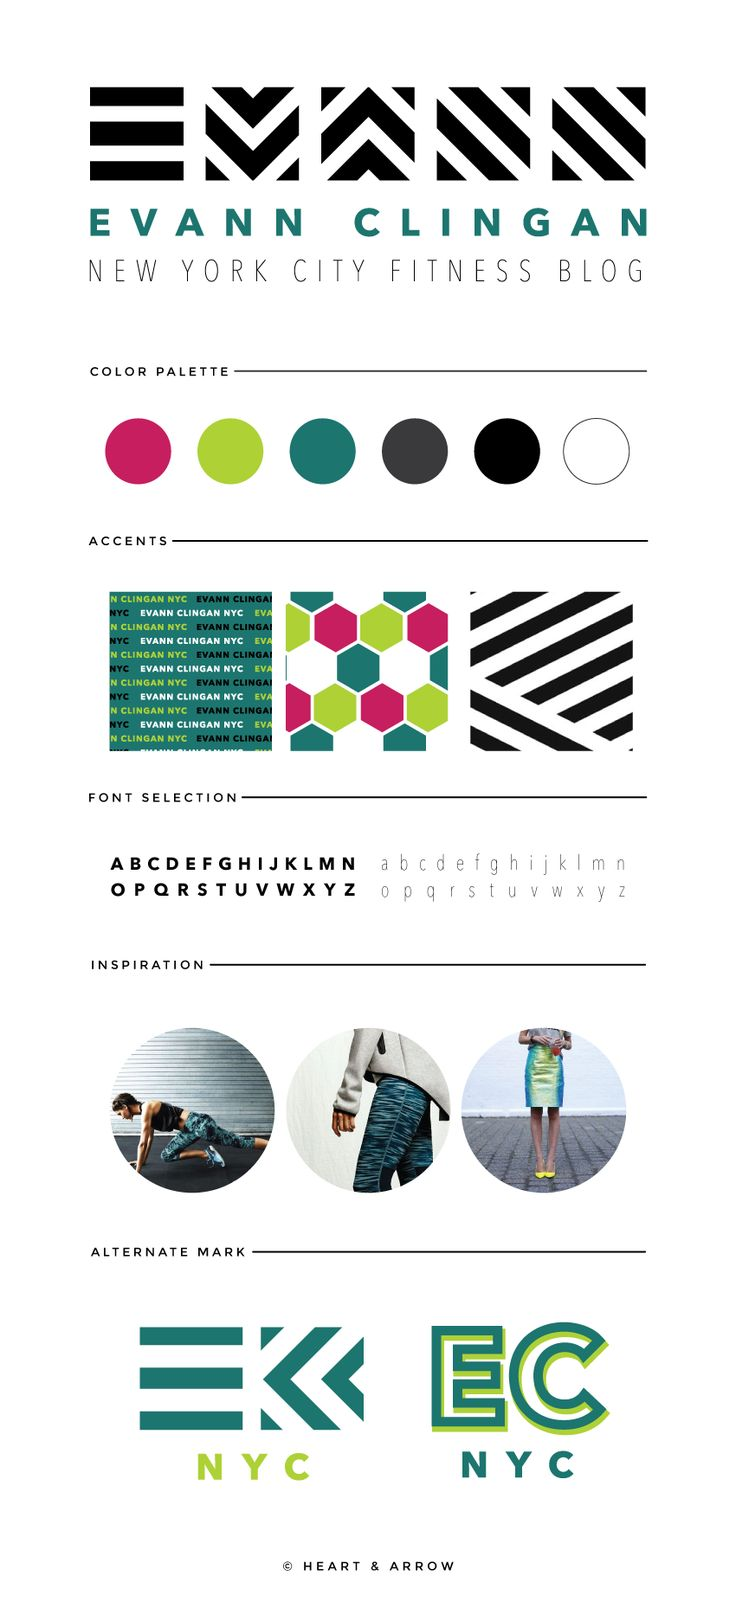 Cassandra cappello graphic design toronto - Brand Board For Evann Clingan New York City Fitness Blog Logo Desinggraphic Design